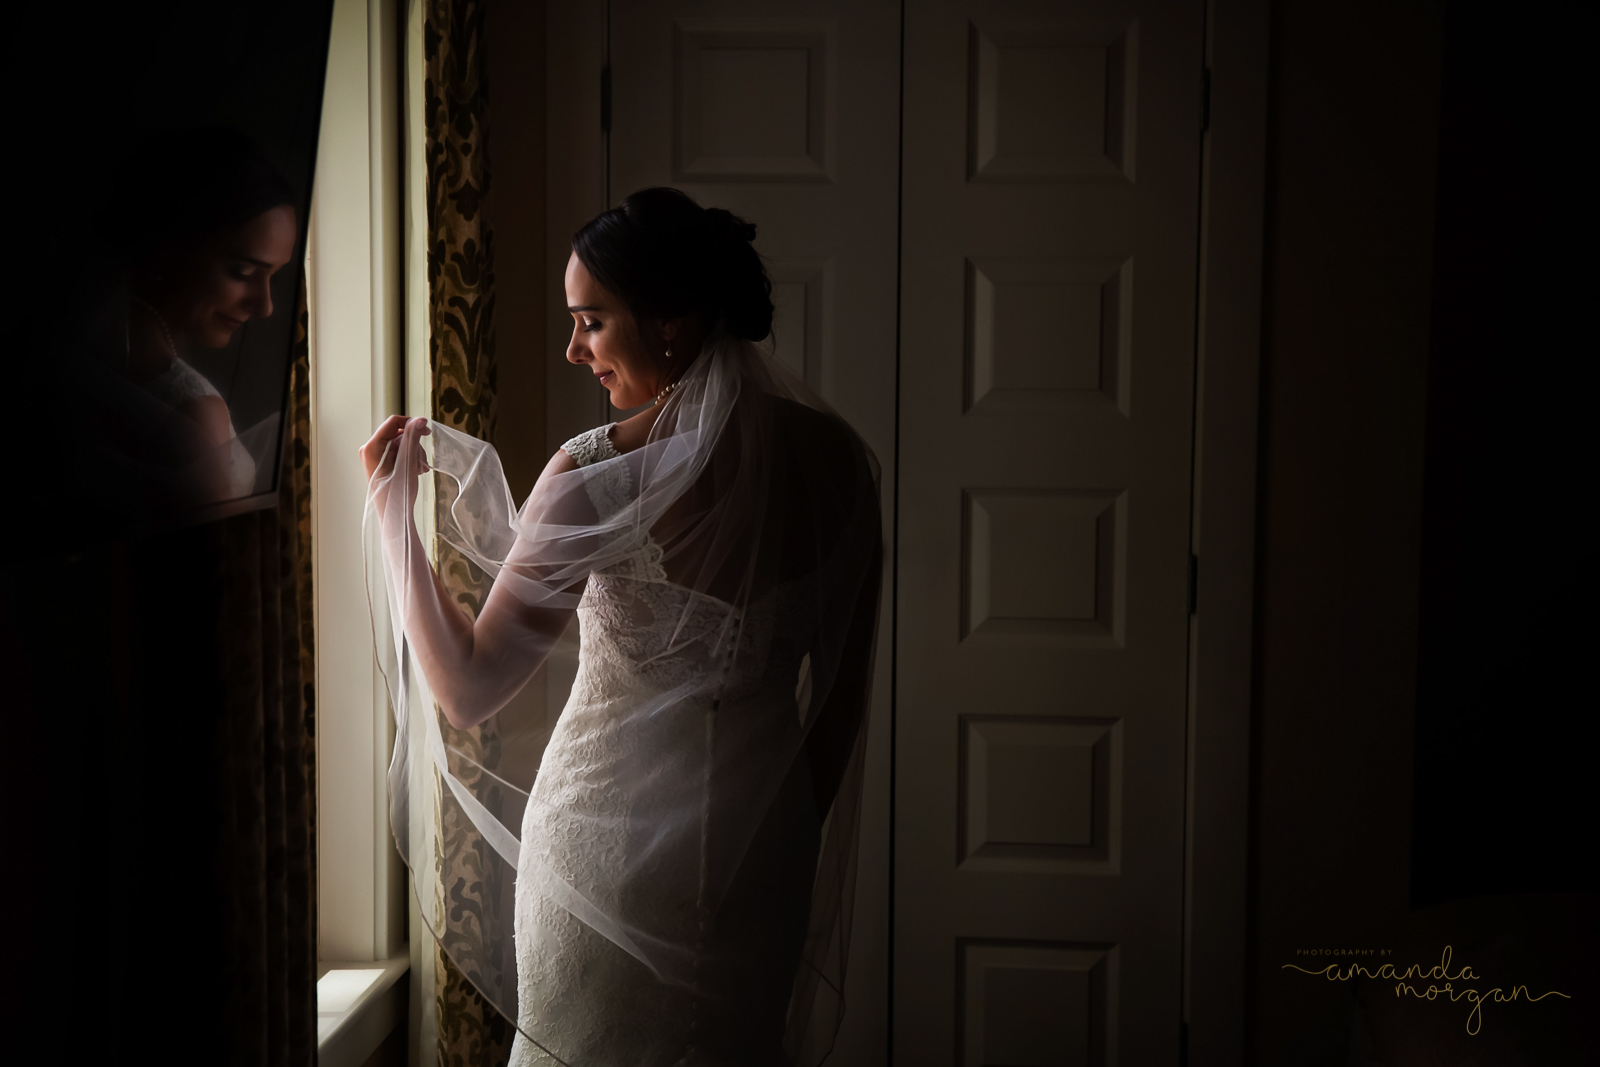 Publick-House-Wedding-Amanda-Morgan-14.jpg